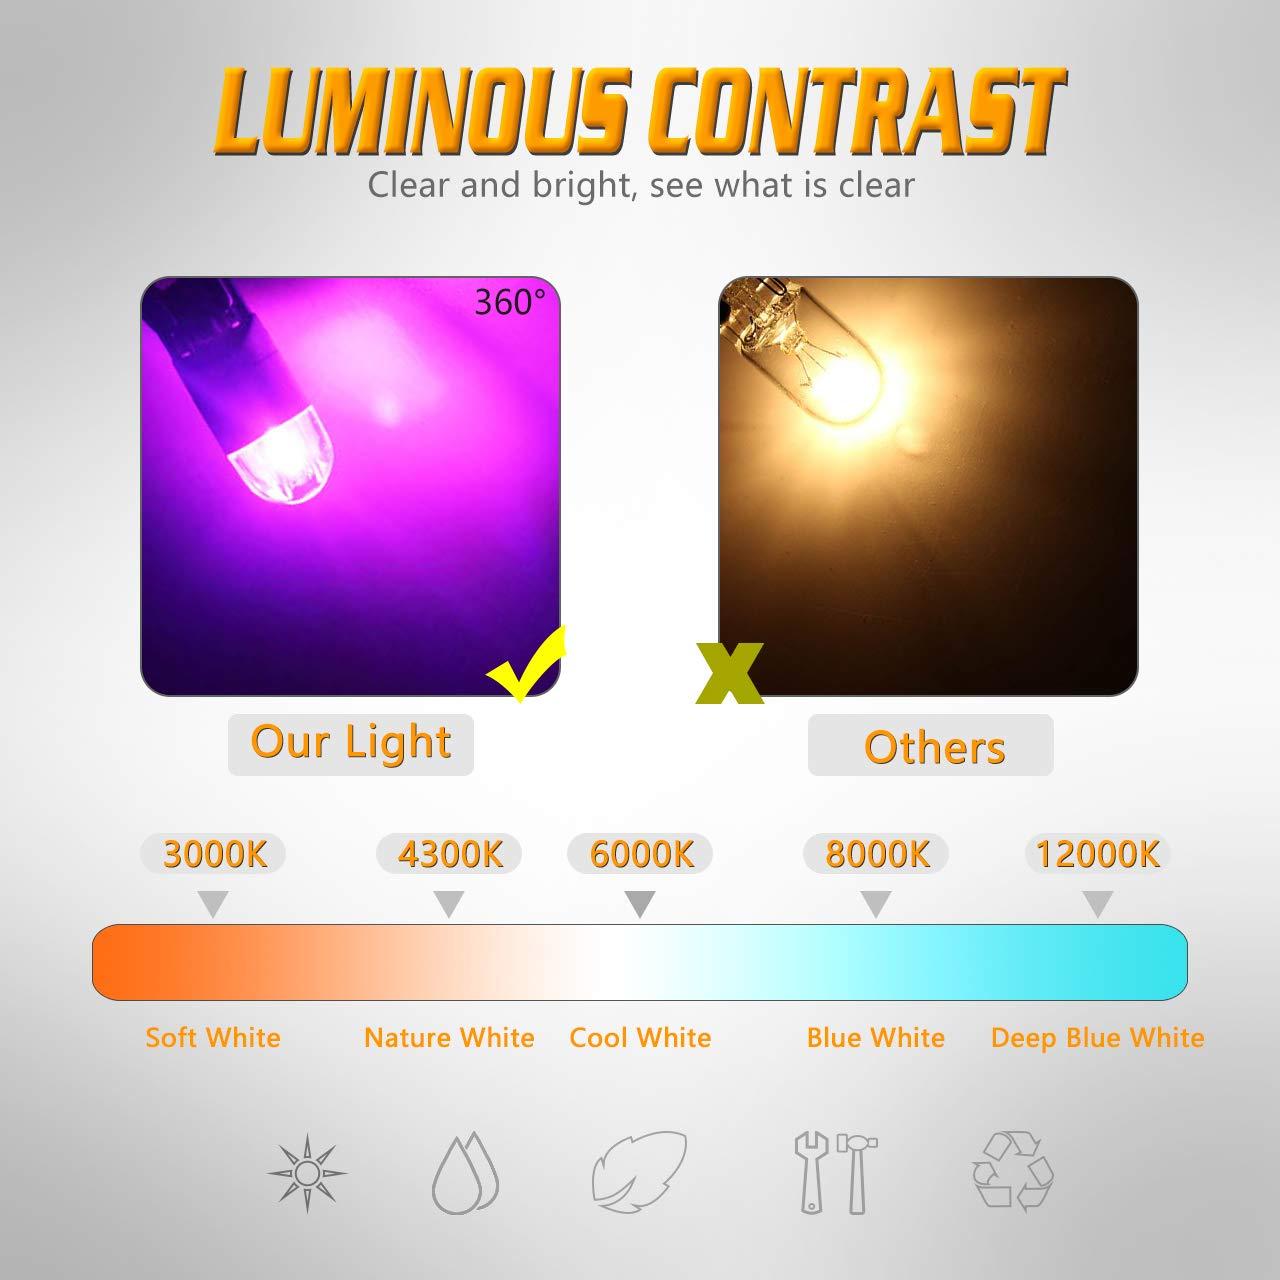 blanc Lot de 2 ampoules LED T10/W5/W 3030/2SMD 360 lumens Tuincyn